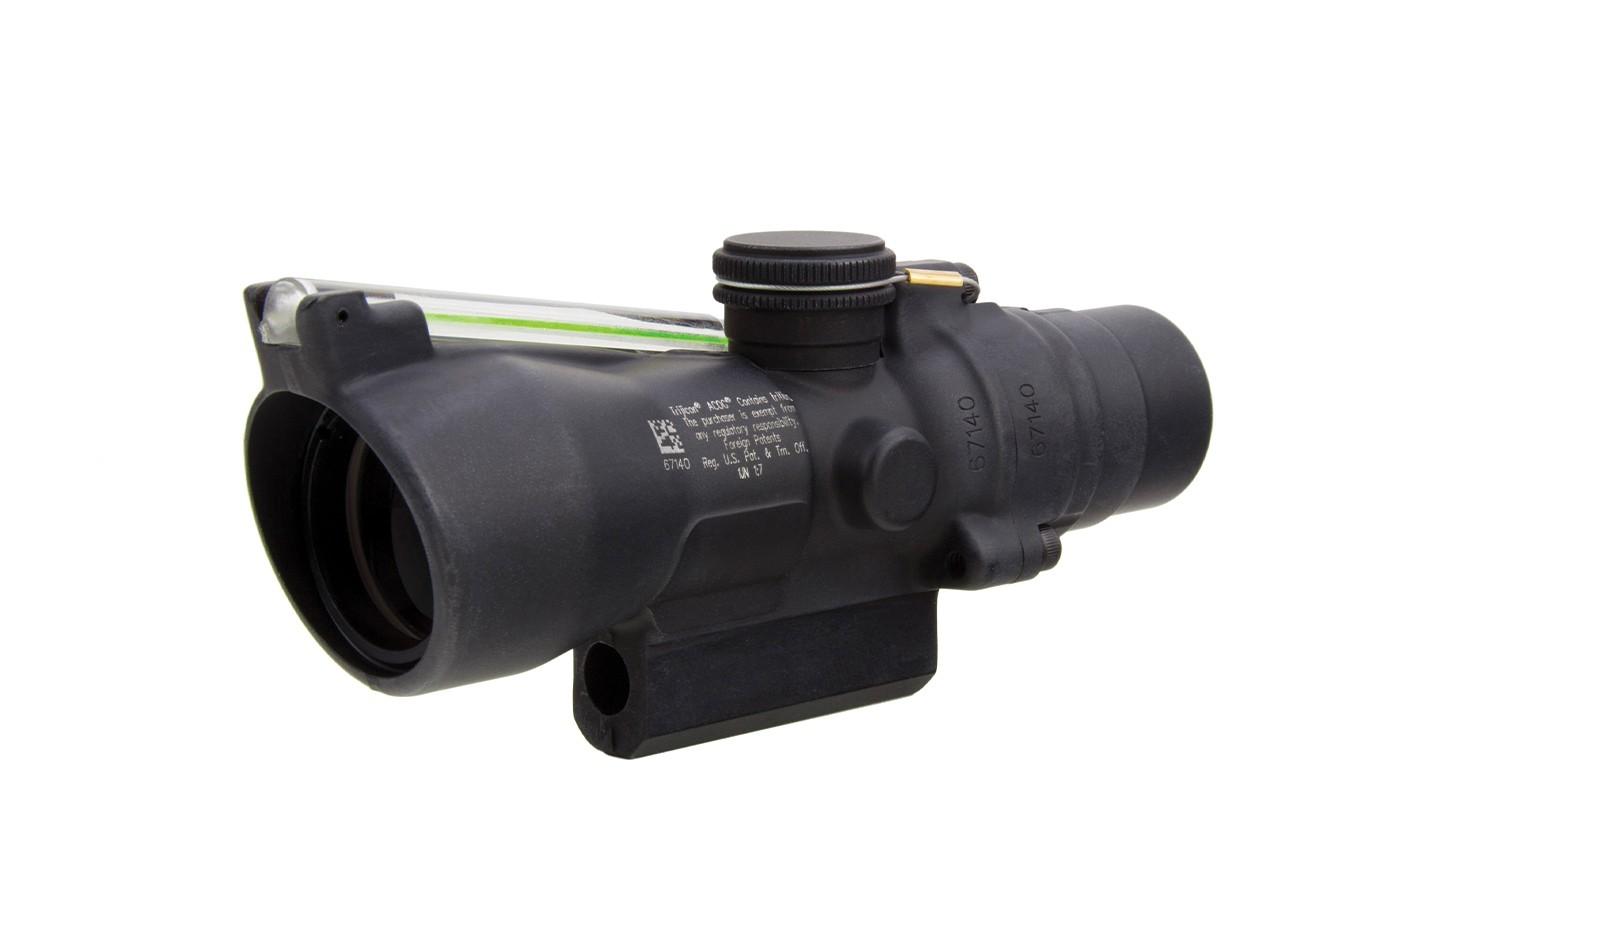 Trijicon ACOG® 3x24 XB Crossbow Scope - 340 - 400 fps